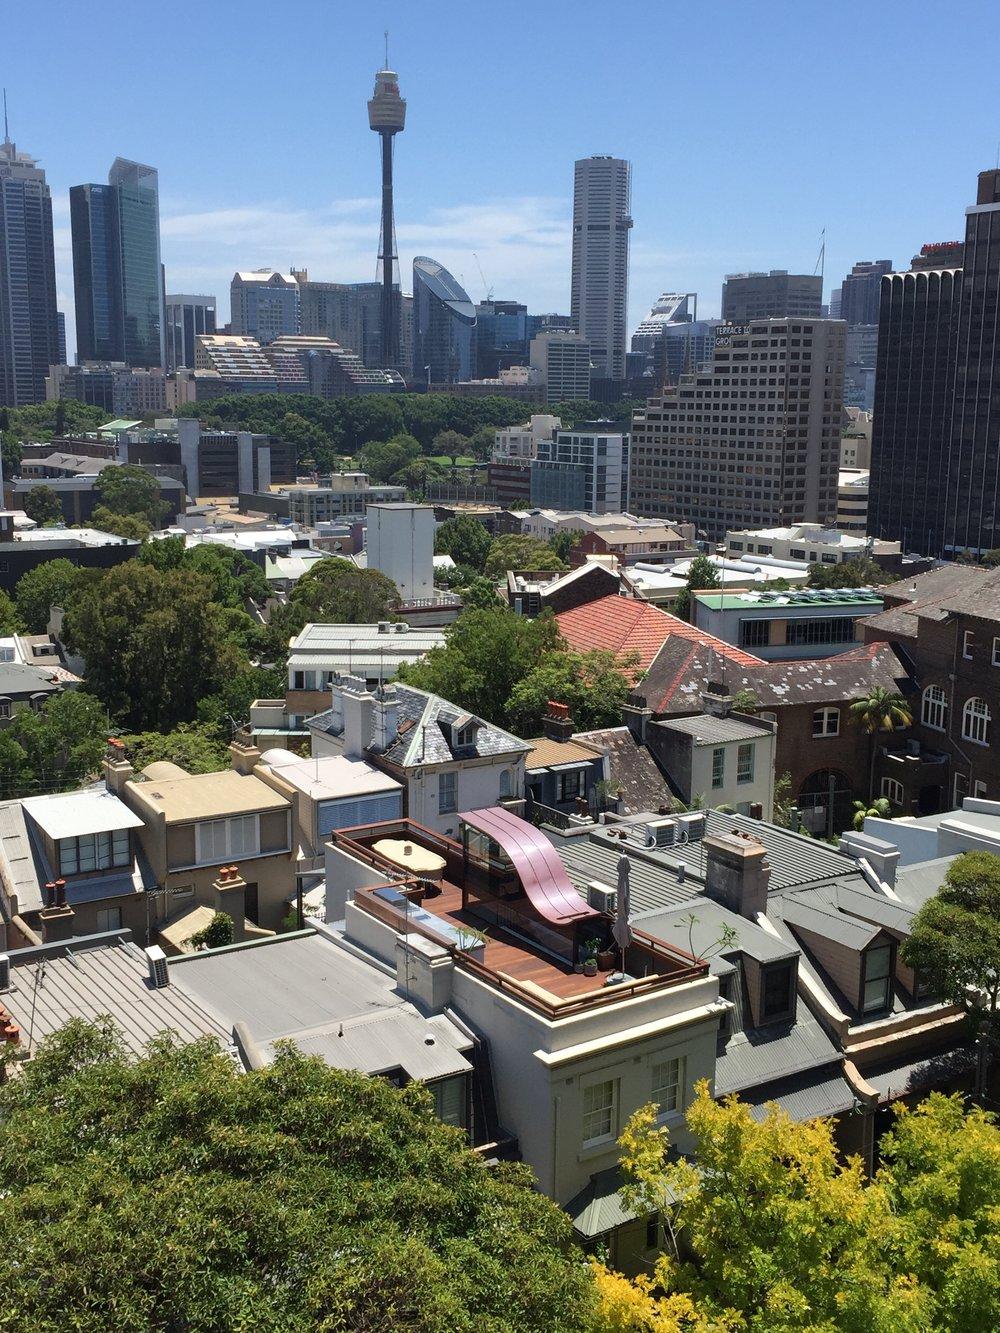 RLY-rooftop sydney city skyline RDO TomFerguson.JPG